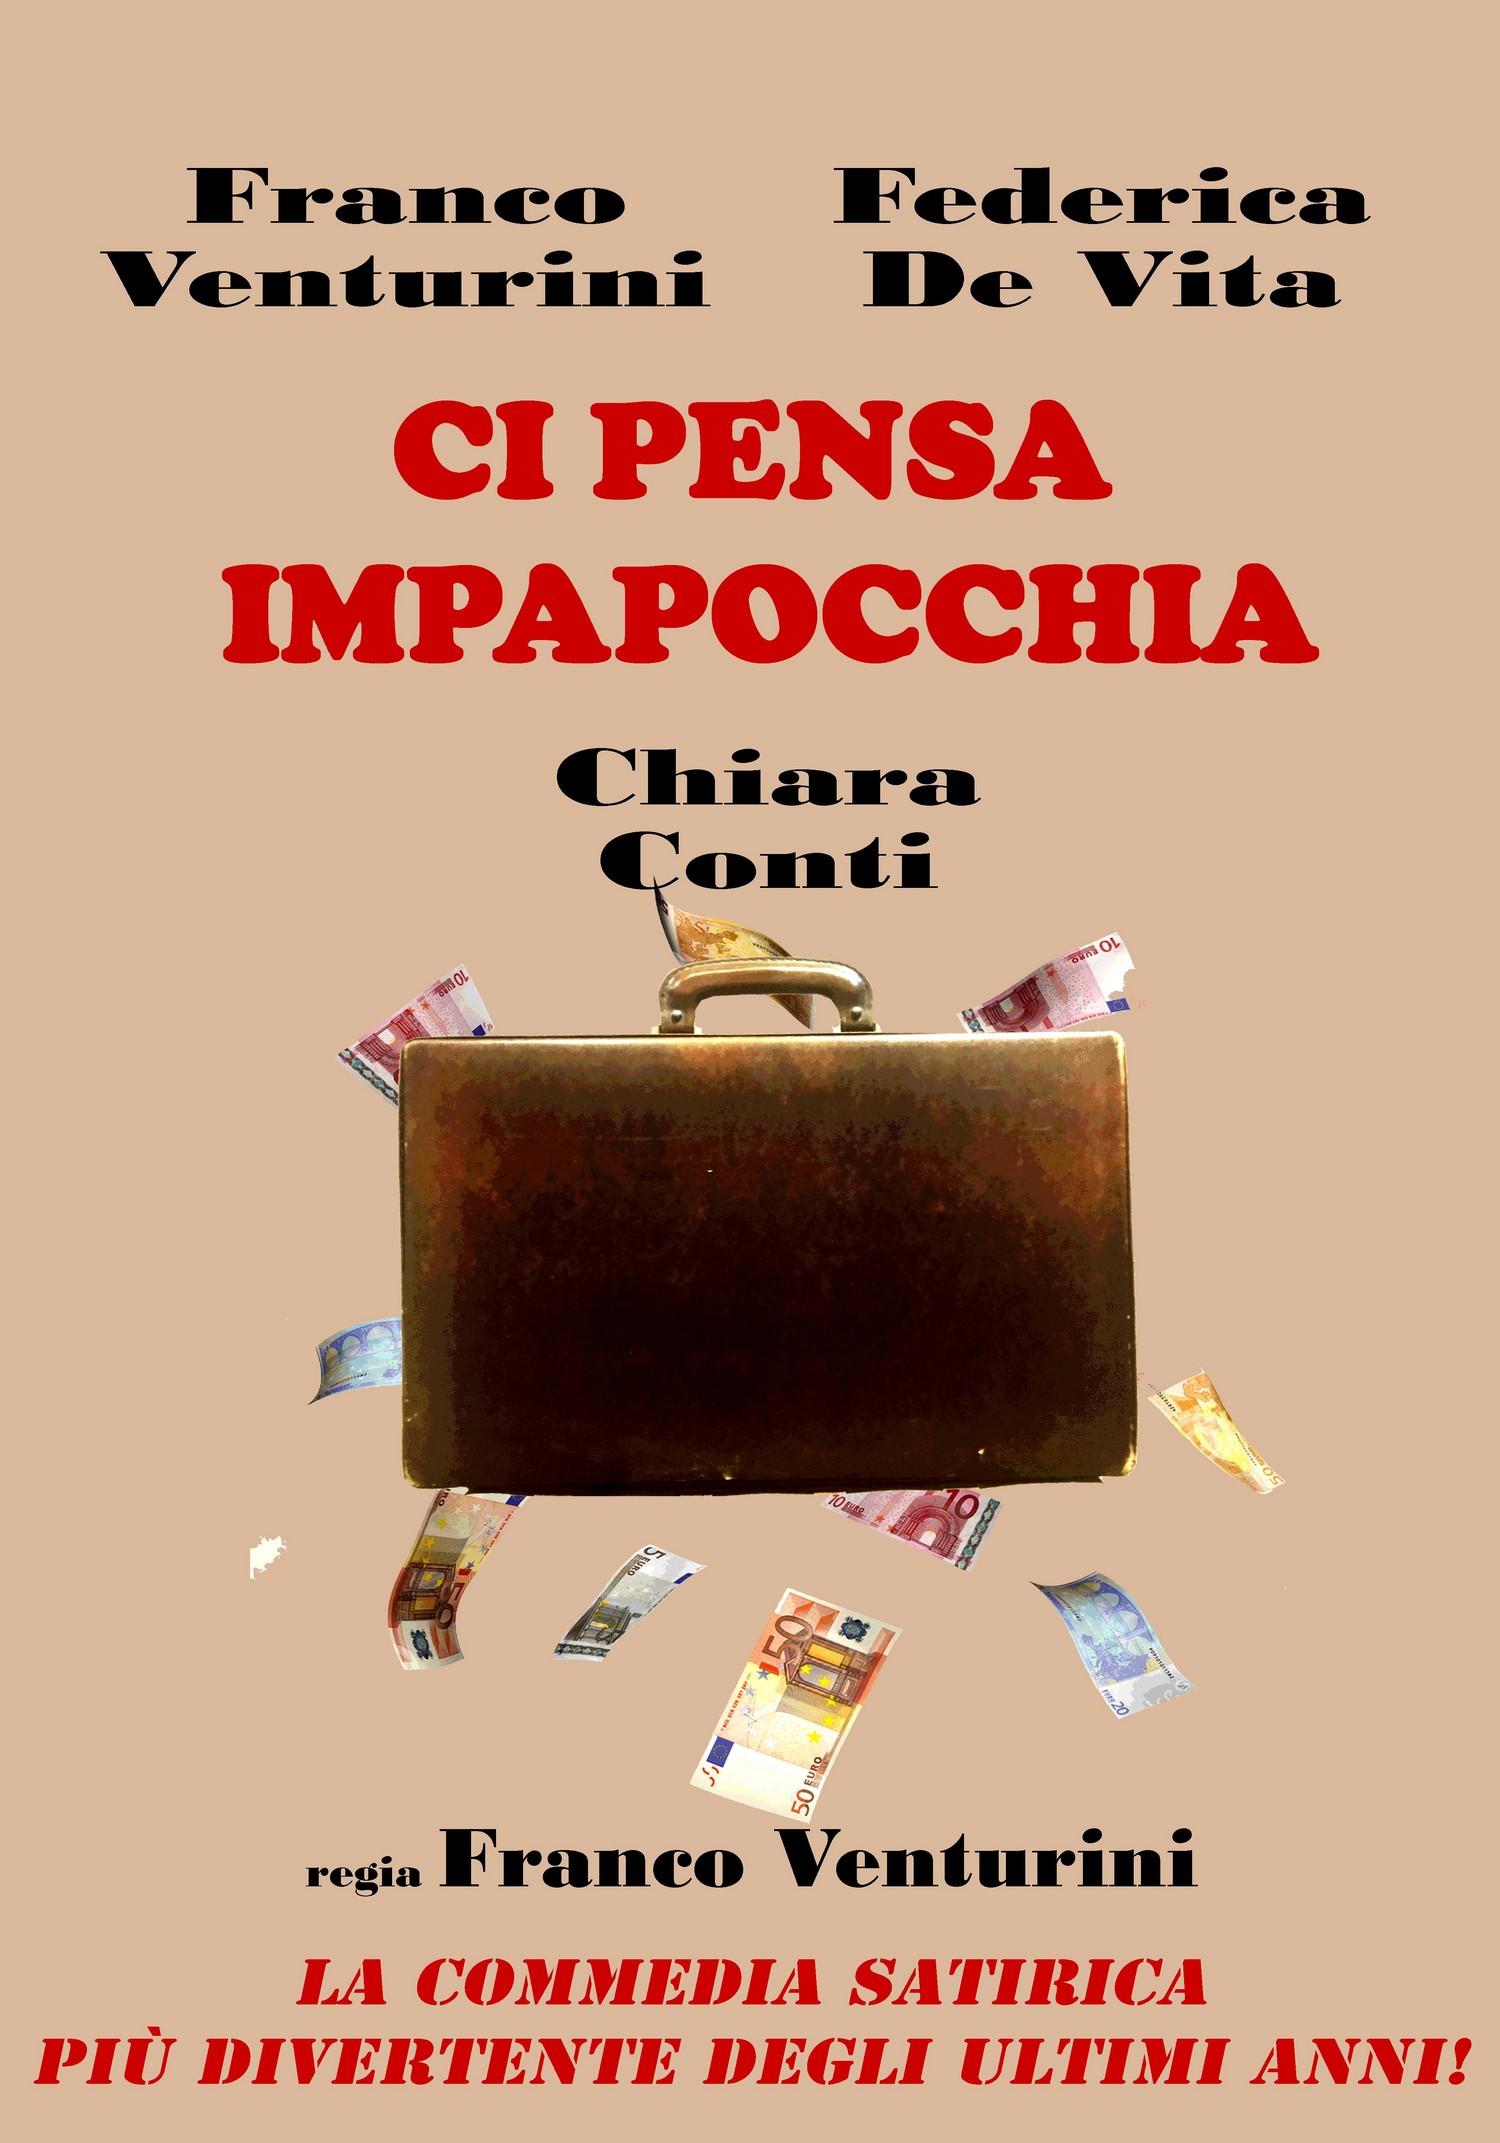 Ci Pensa Impacocchia, Teatro Flavio Roma